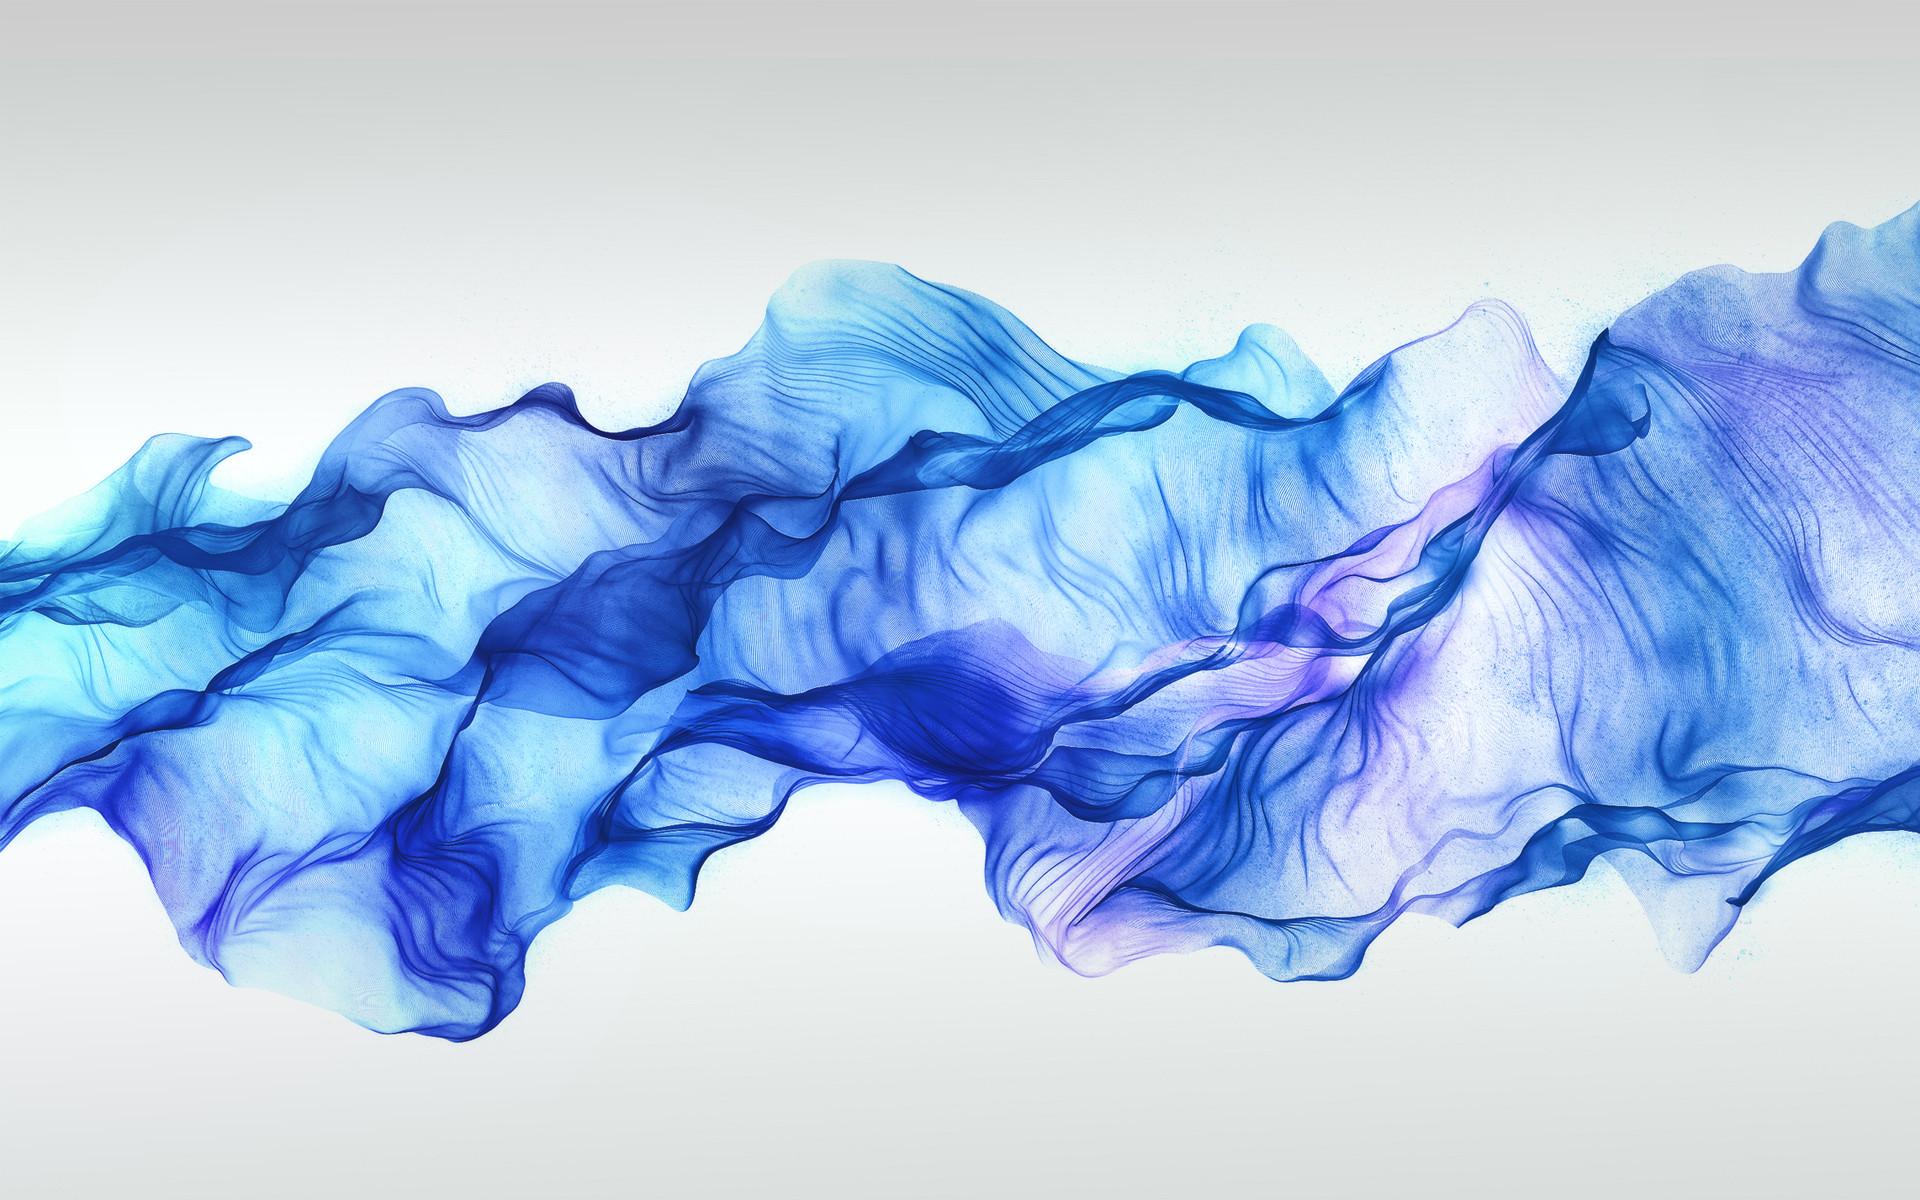 <br /><br />42% of mens favorite color is blue. 29% of women&apos;s  favorite color is blue.